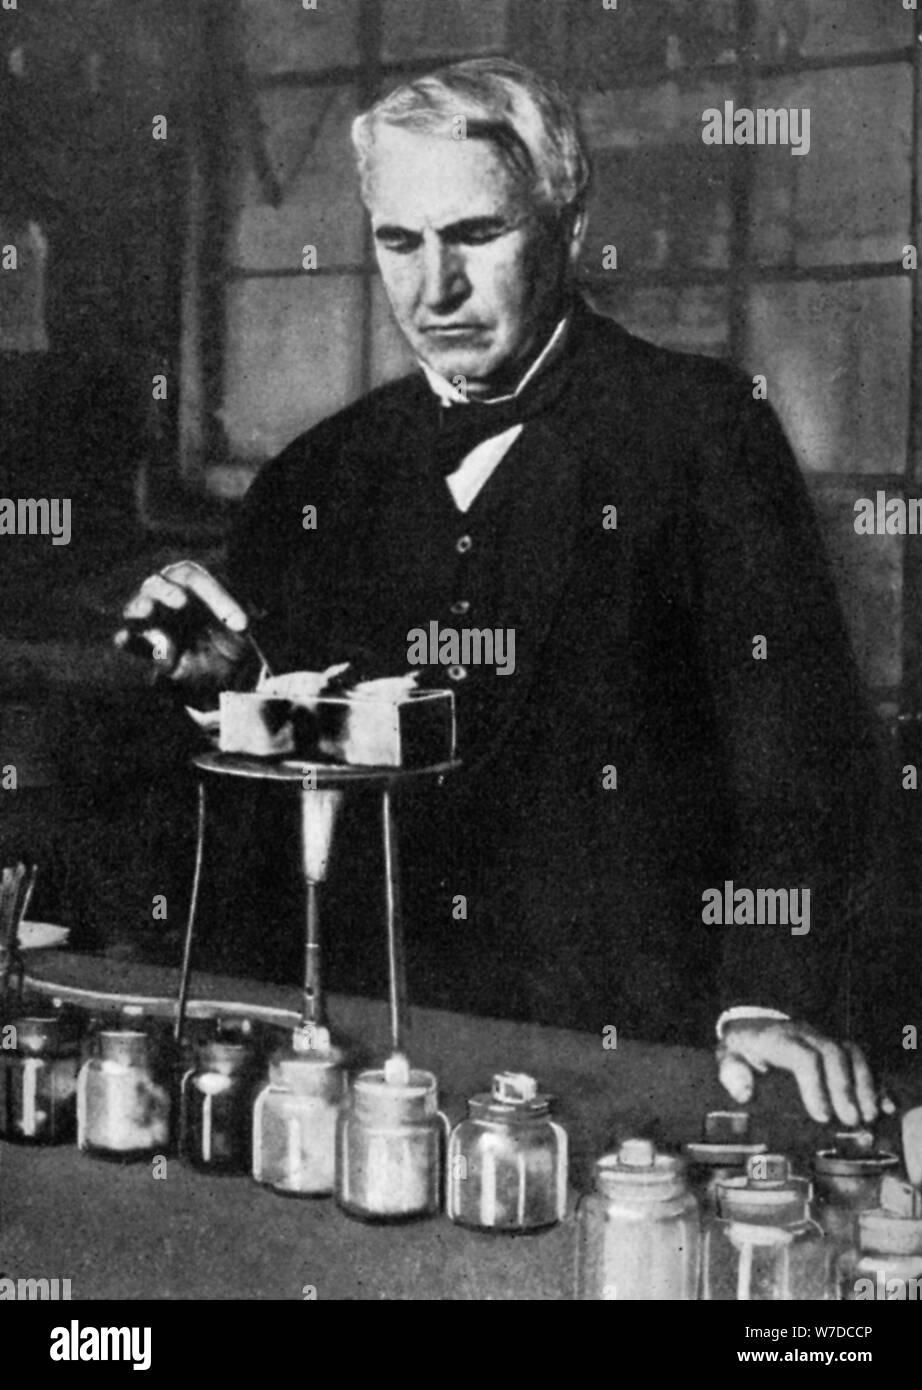 Thomas Alva Edison American Inventor And Businessman 1926